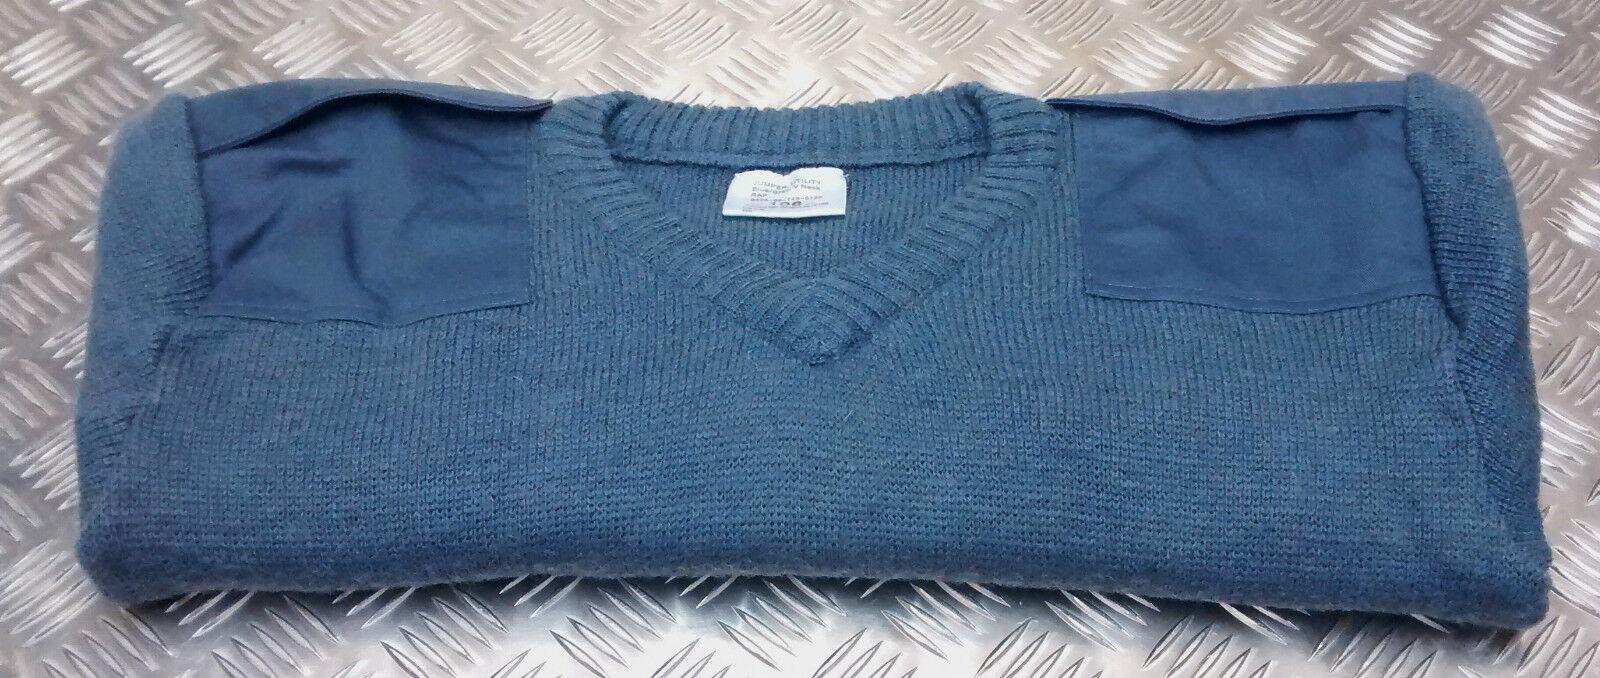 Genuine British RAF Royal Air Force Wool Jumper / Pullover V-Neck - All Sizes